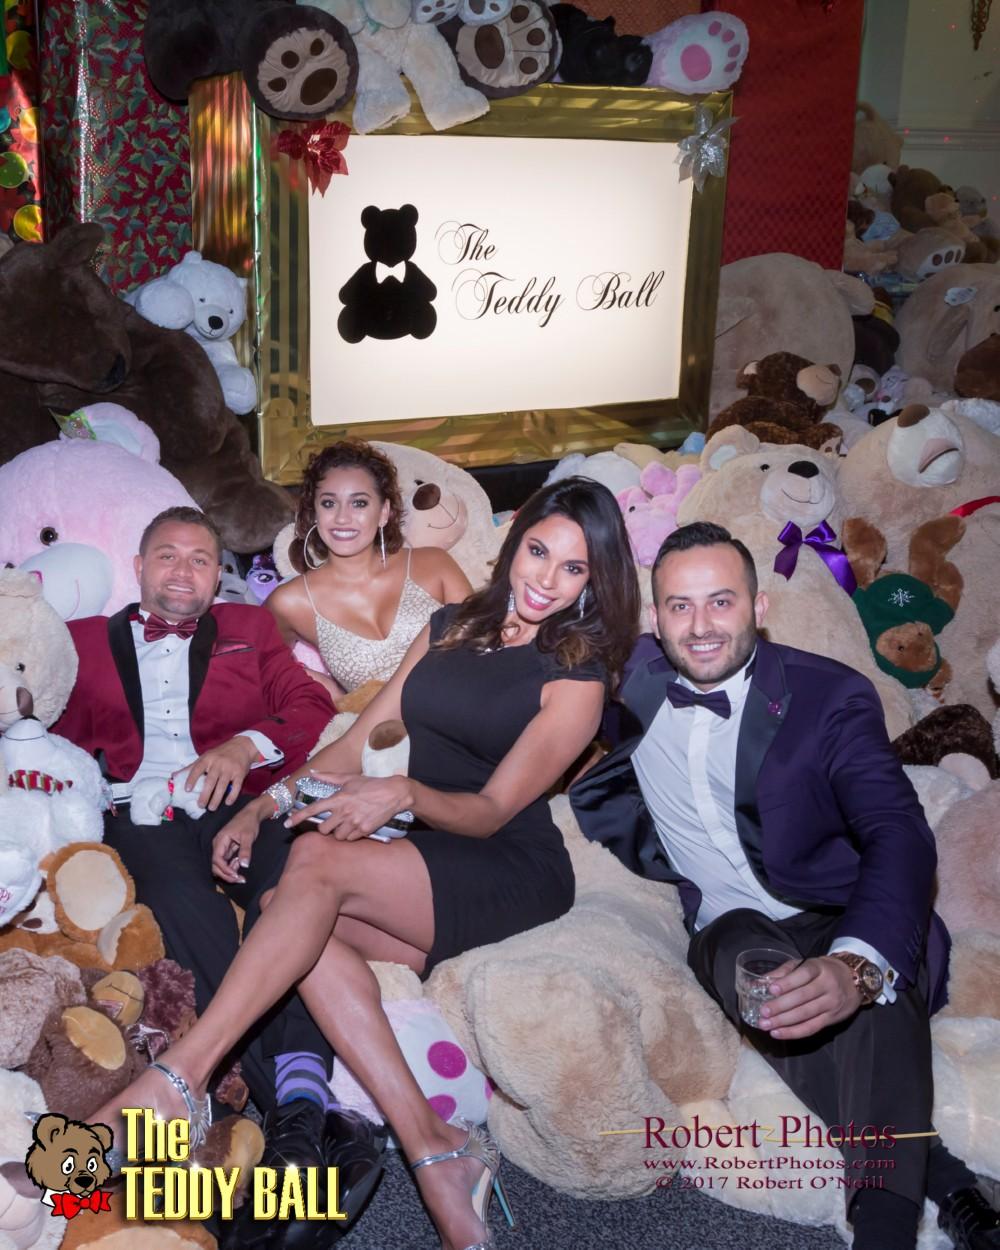 Teddy-Ball-2017-Robert-Photos- 43.jpg